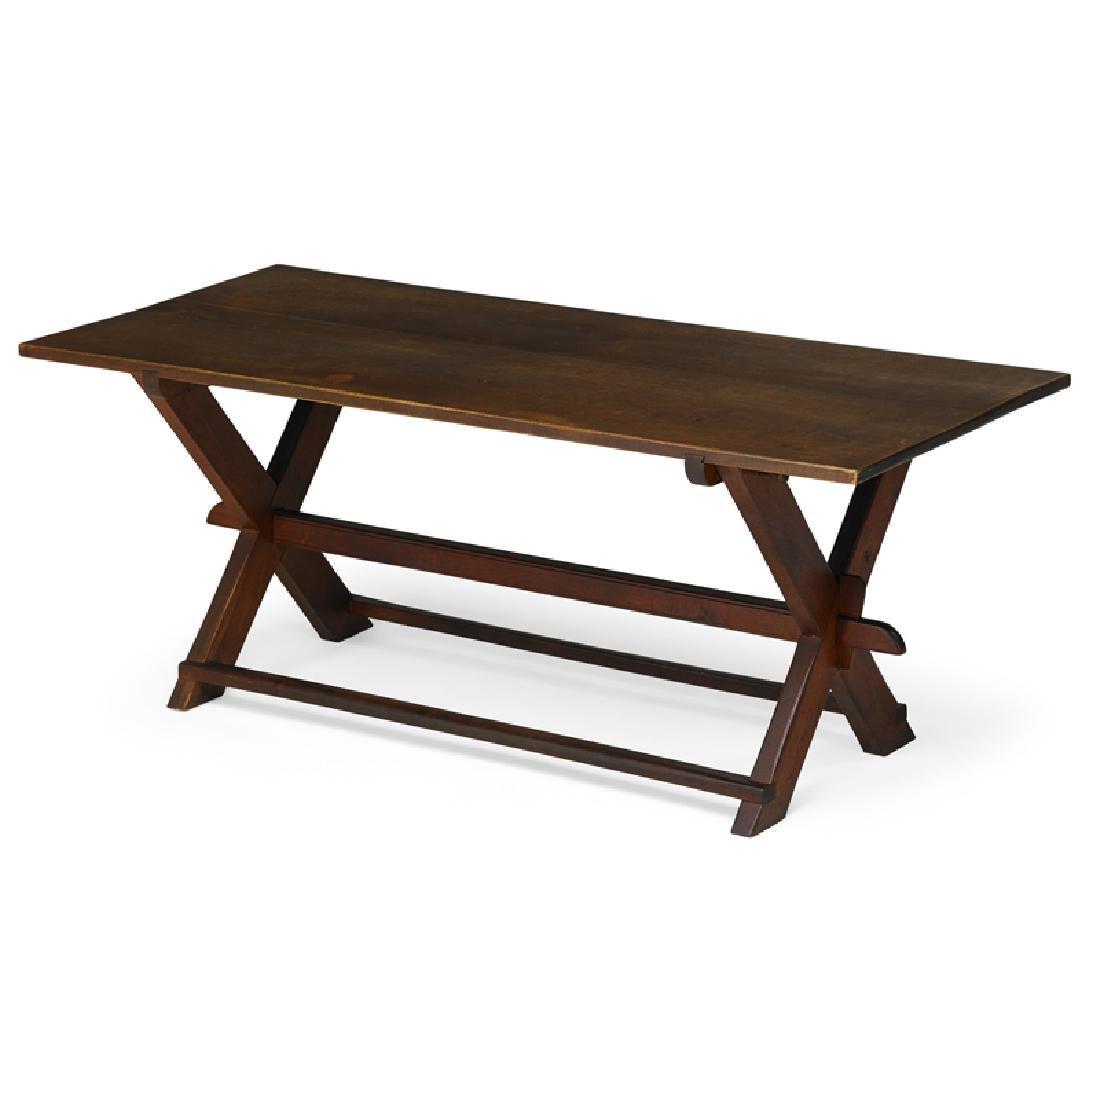 FREDERICK HARER Trestle dining table